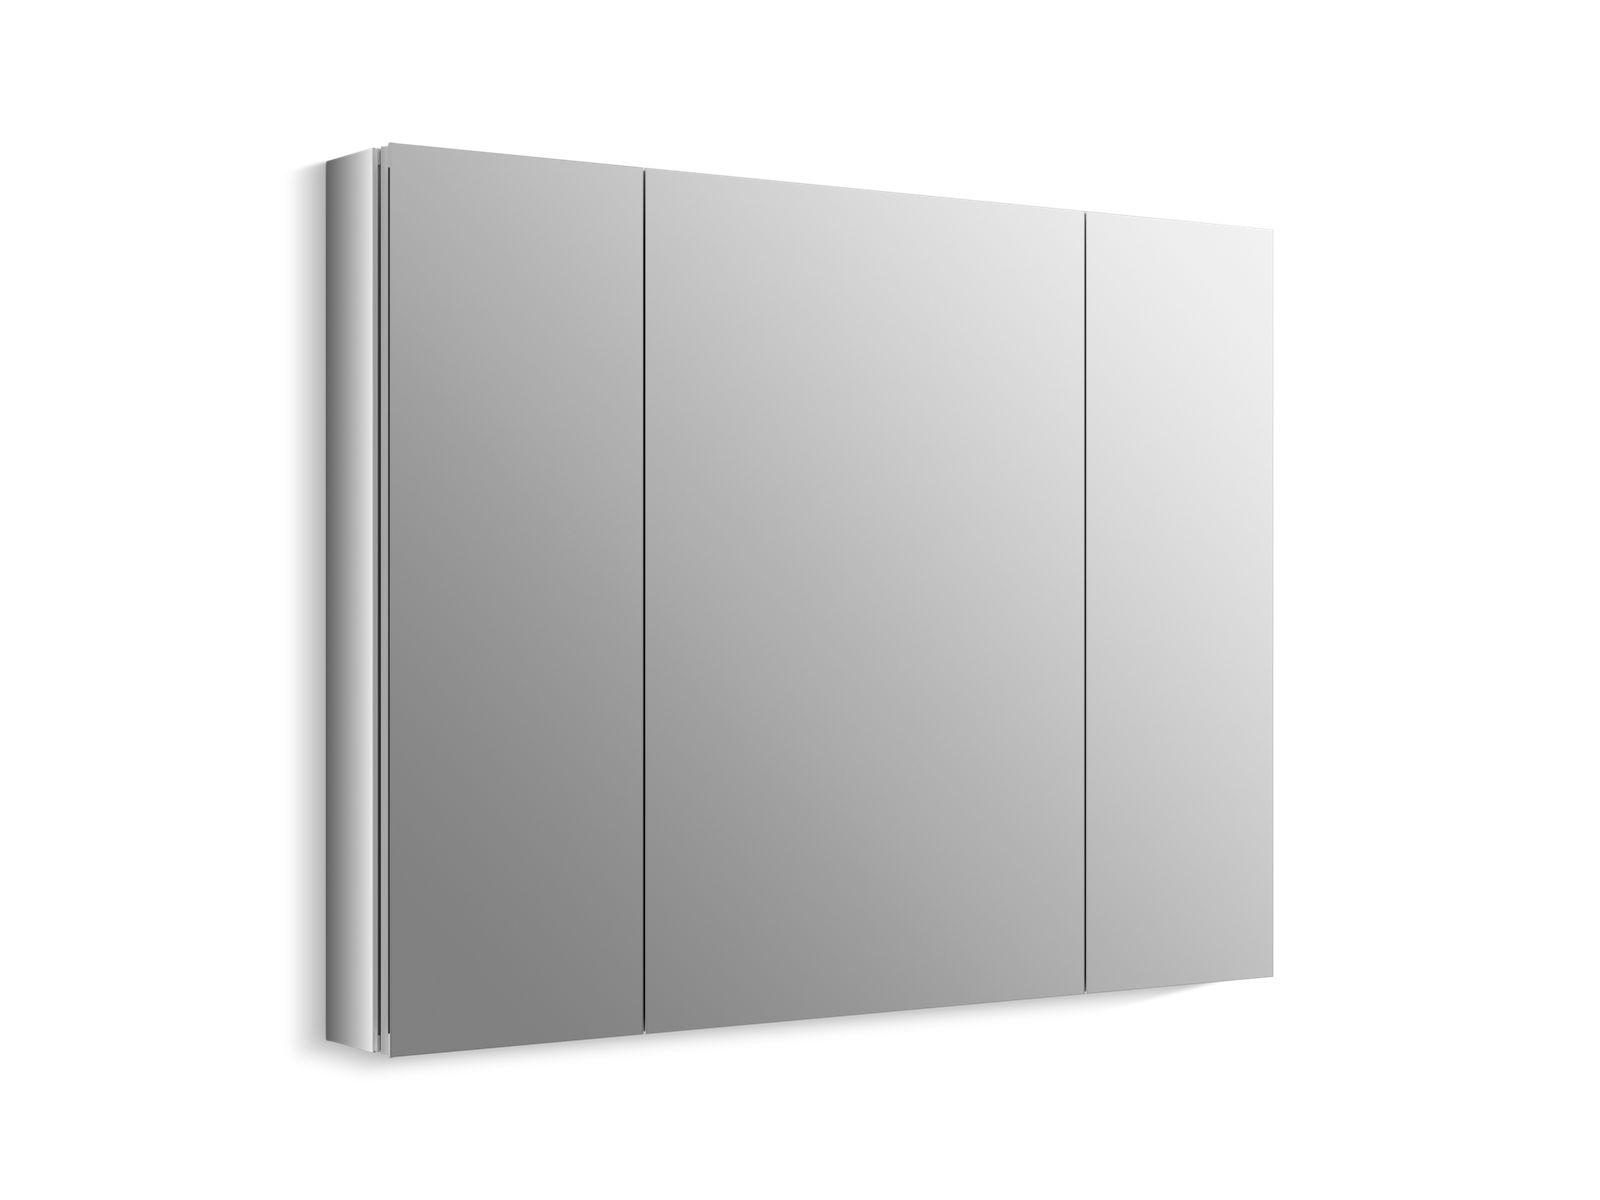 k 99010 verdera medicine cabinet with triple mirrored doors rh us kohler com